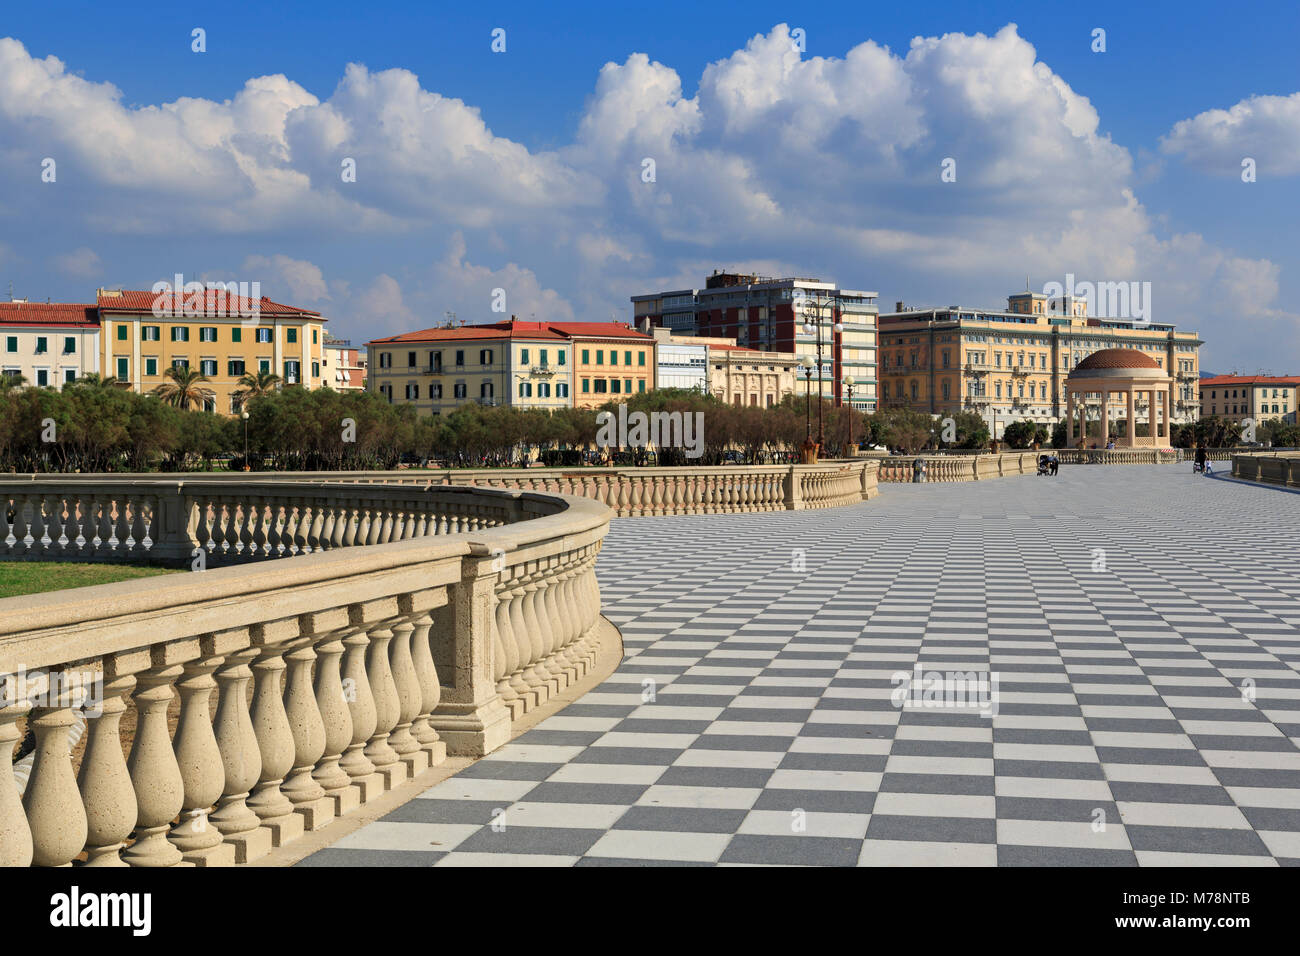 Terrazza Mascagni, Livourne, Toscane, Italie, Europe Photo Stock